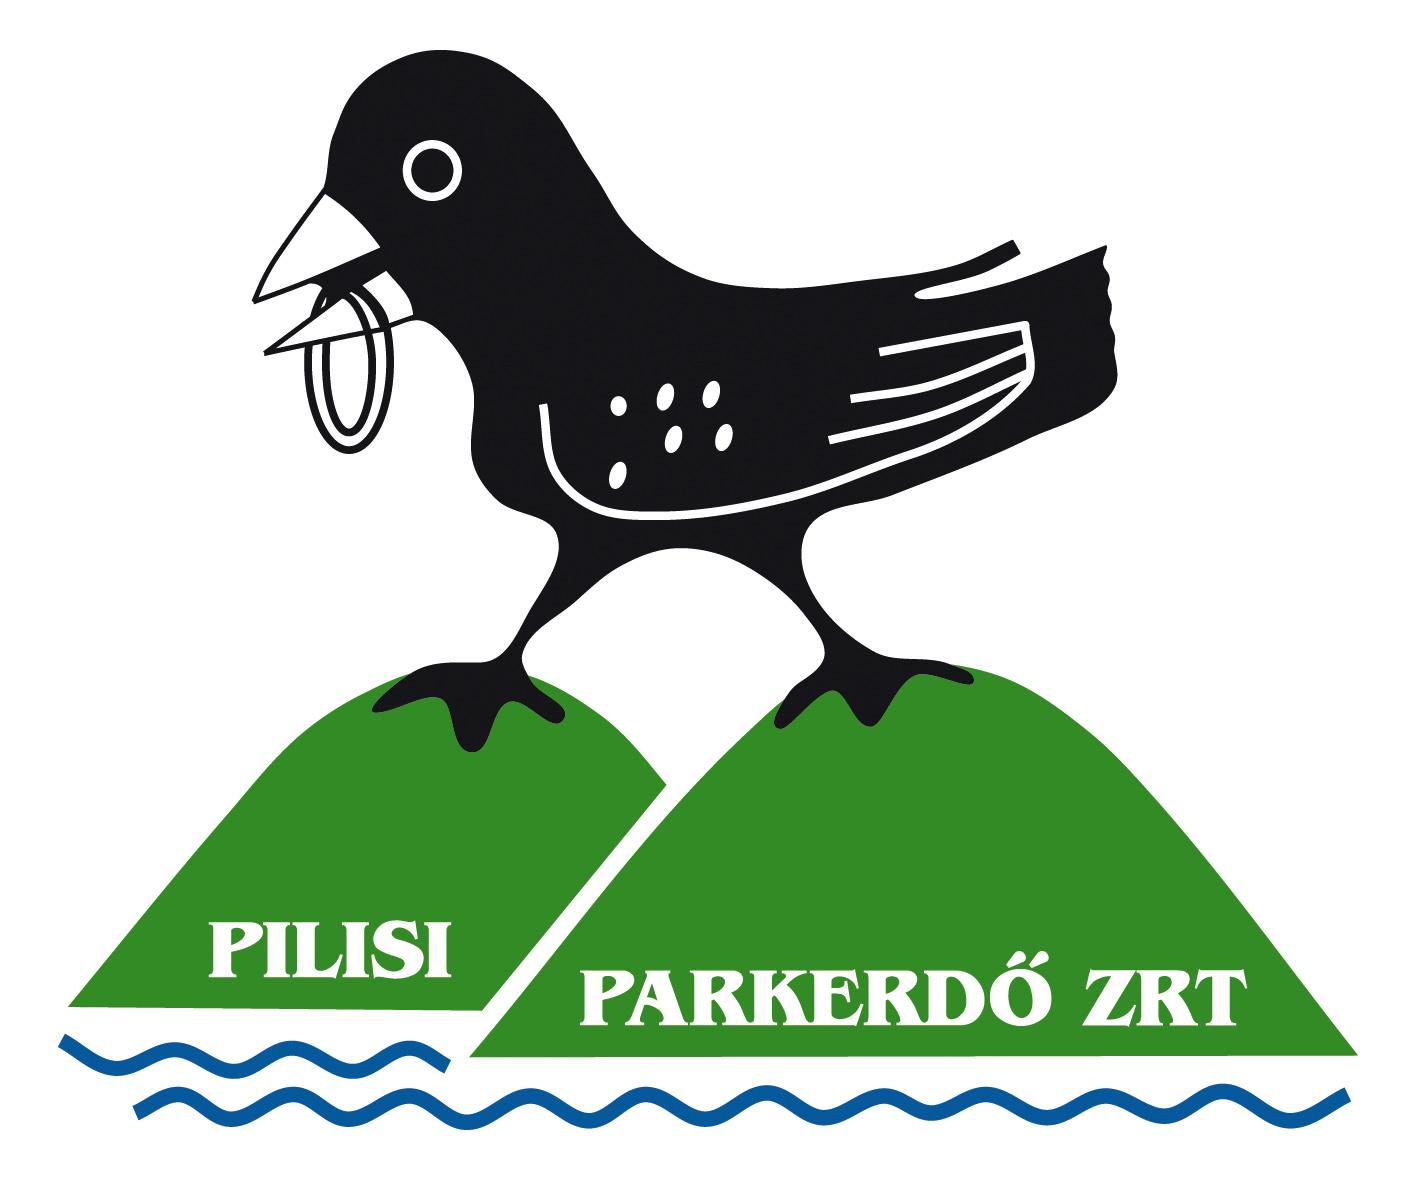 pilisi_parkerdo_logo.jpg